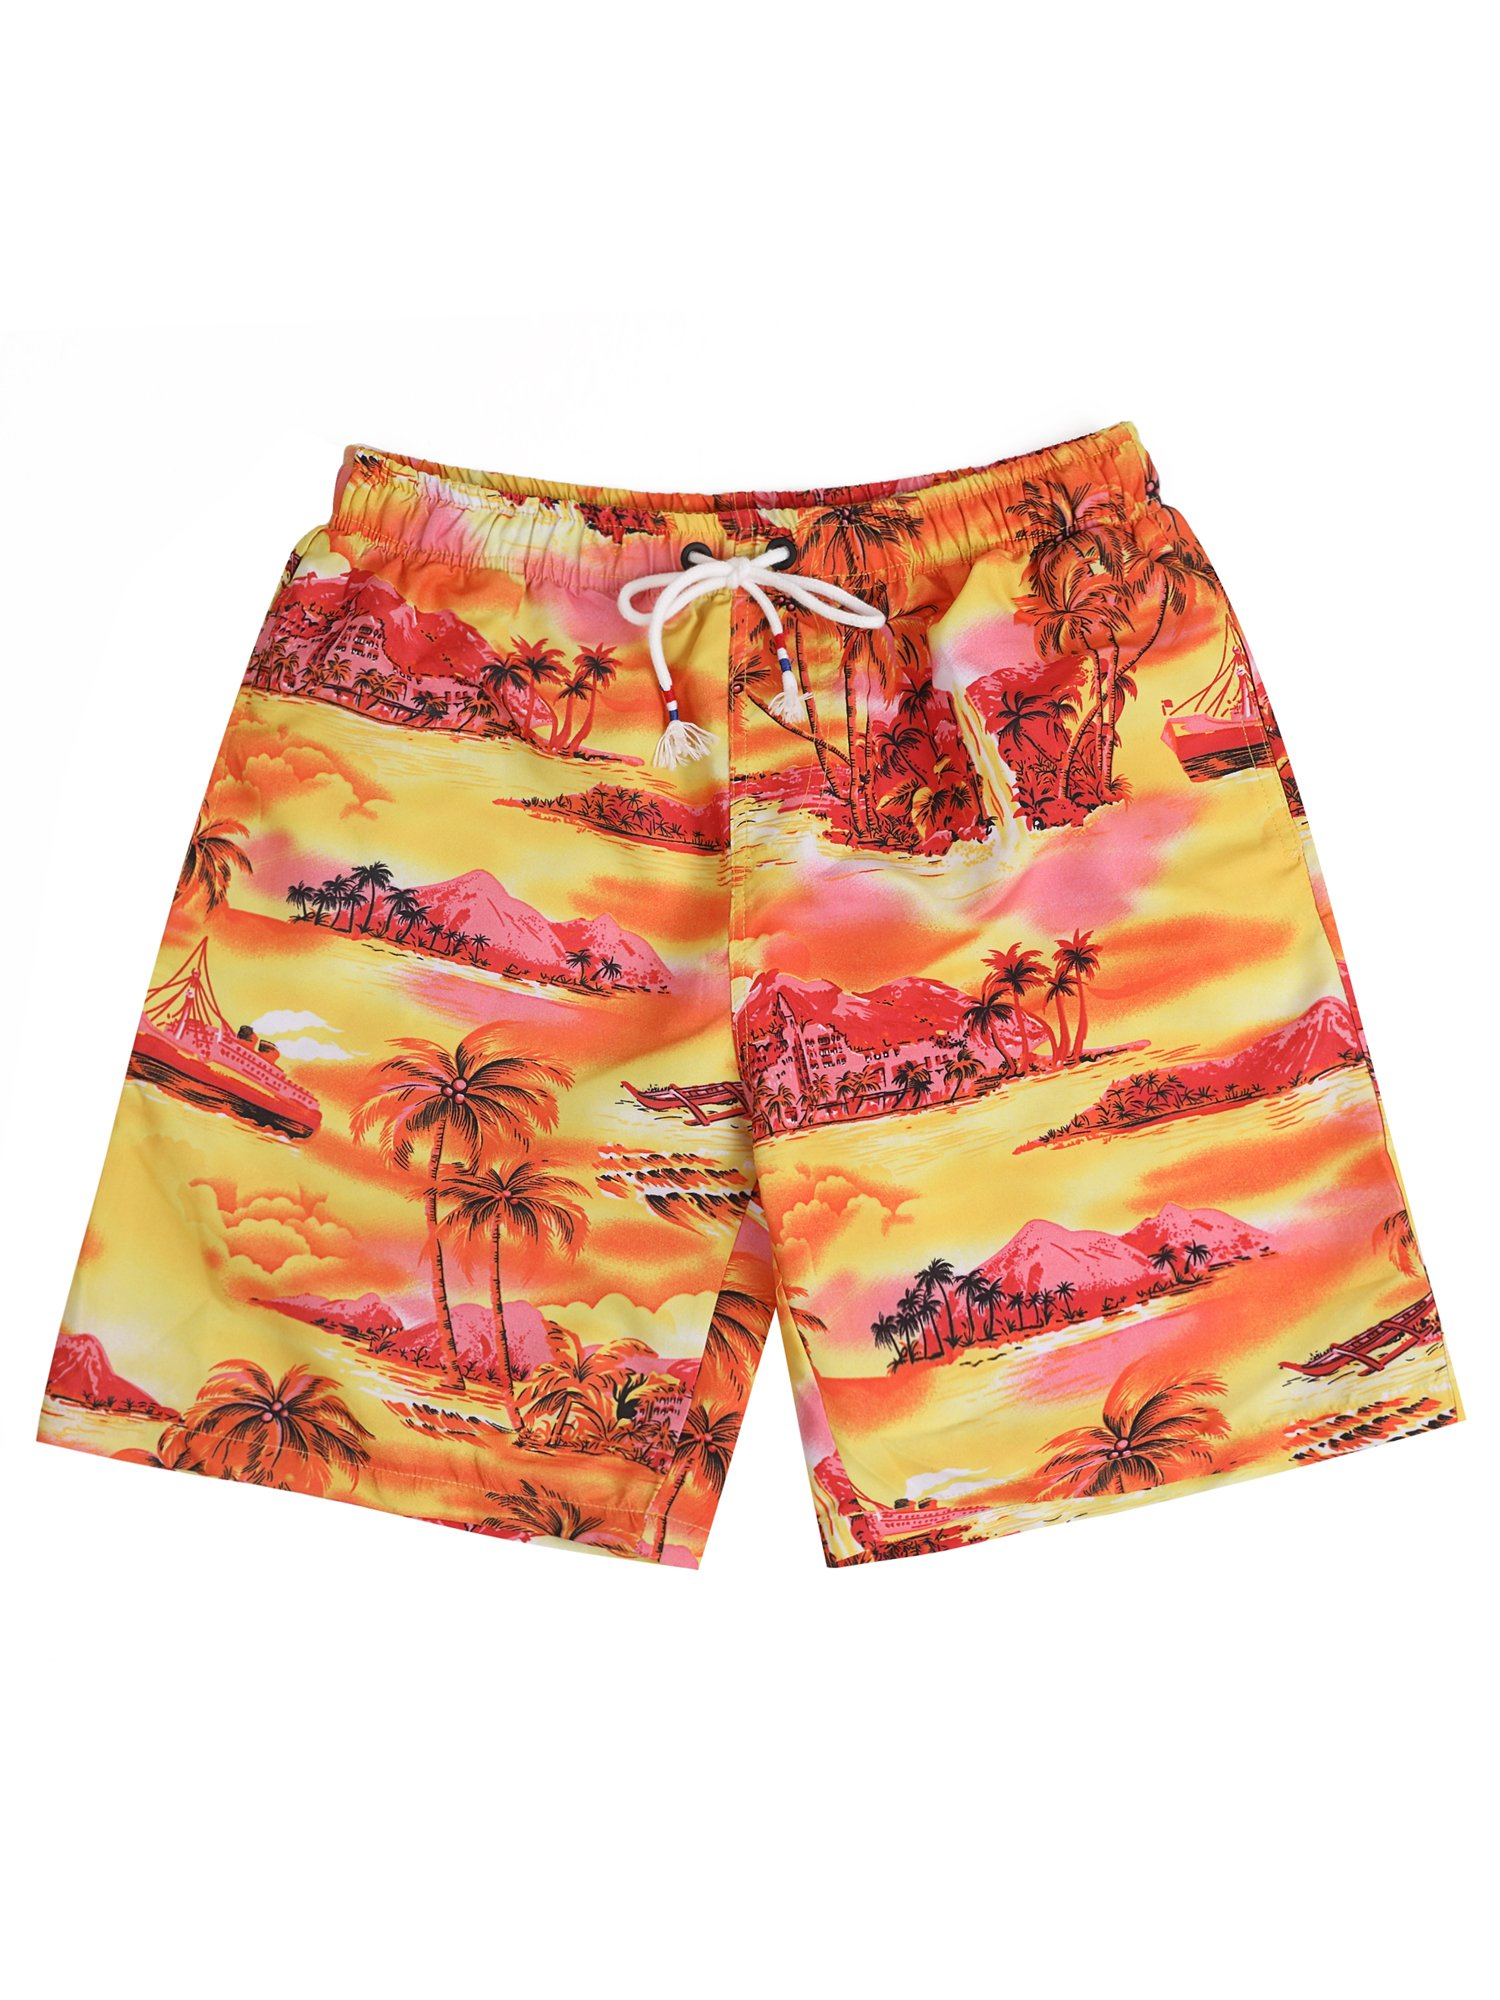 Hopioneer Men's Quick Dry Swimwear Beach Printed Tropical Hawaiian Swim Trunks - S